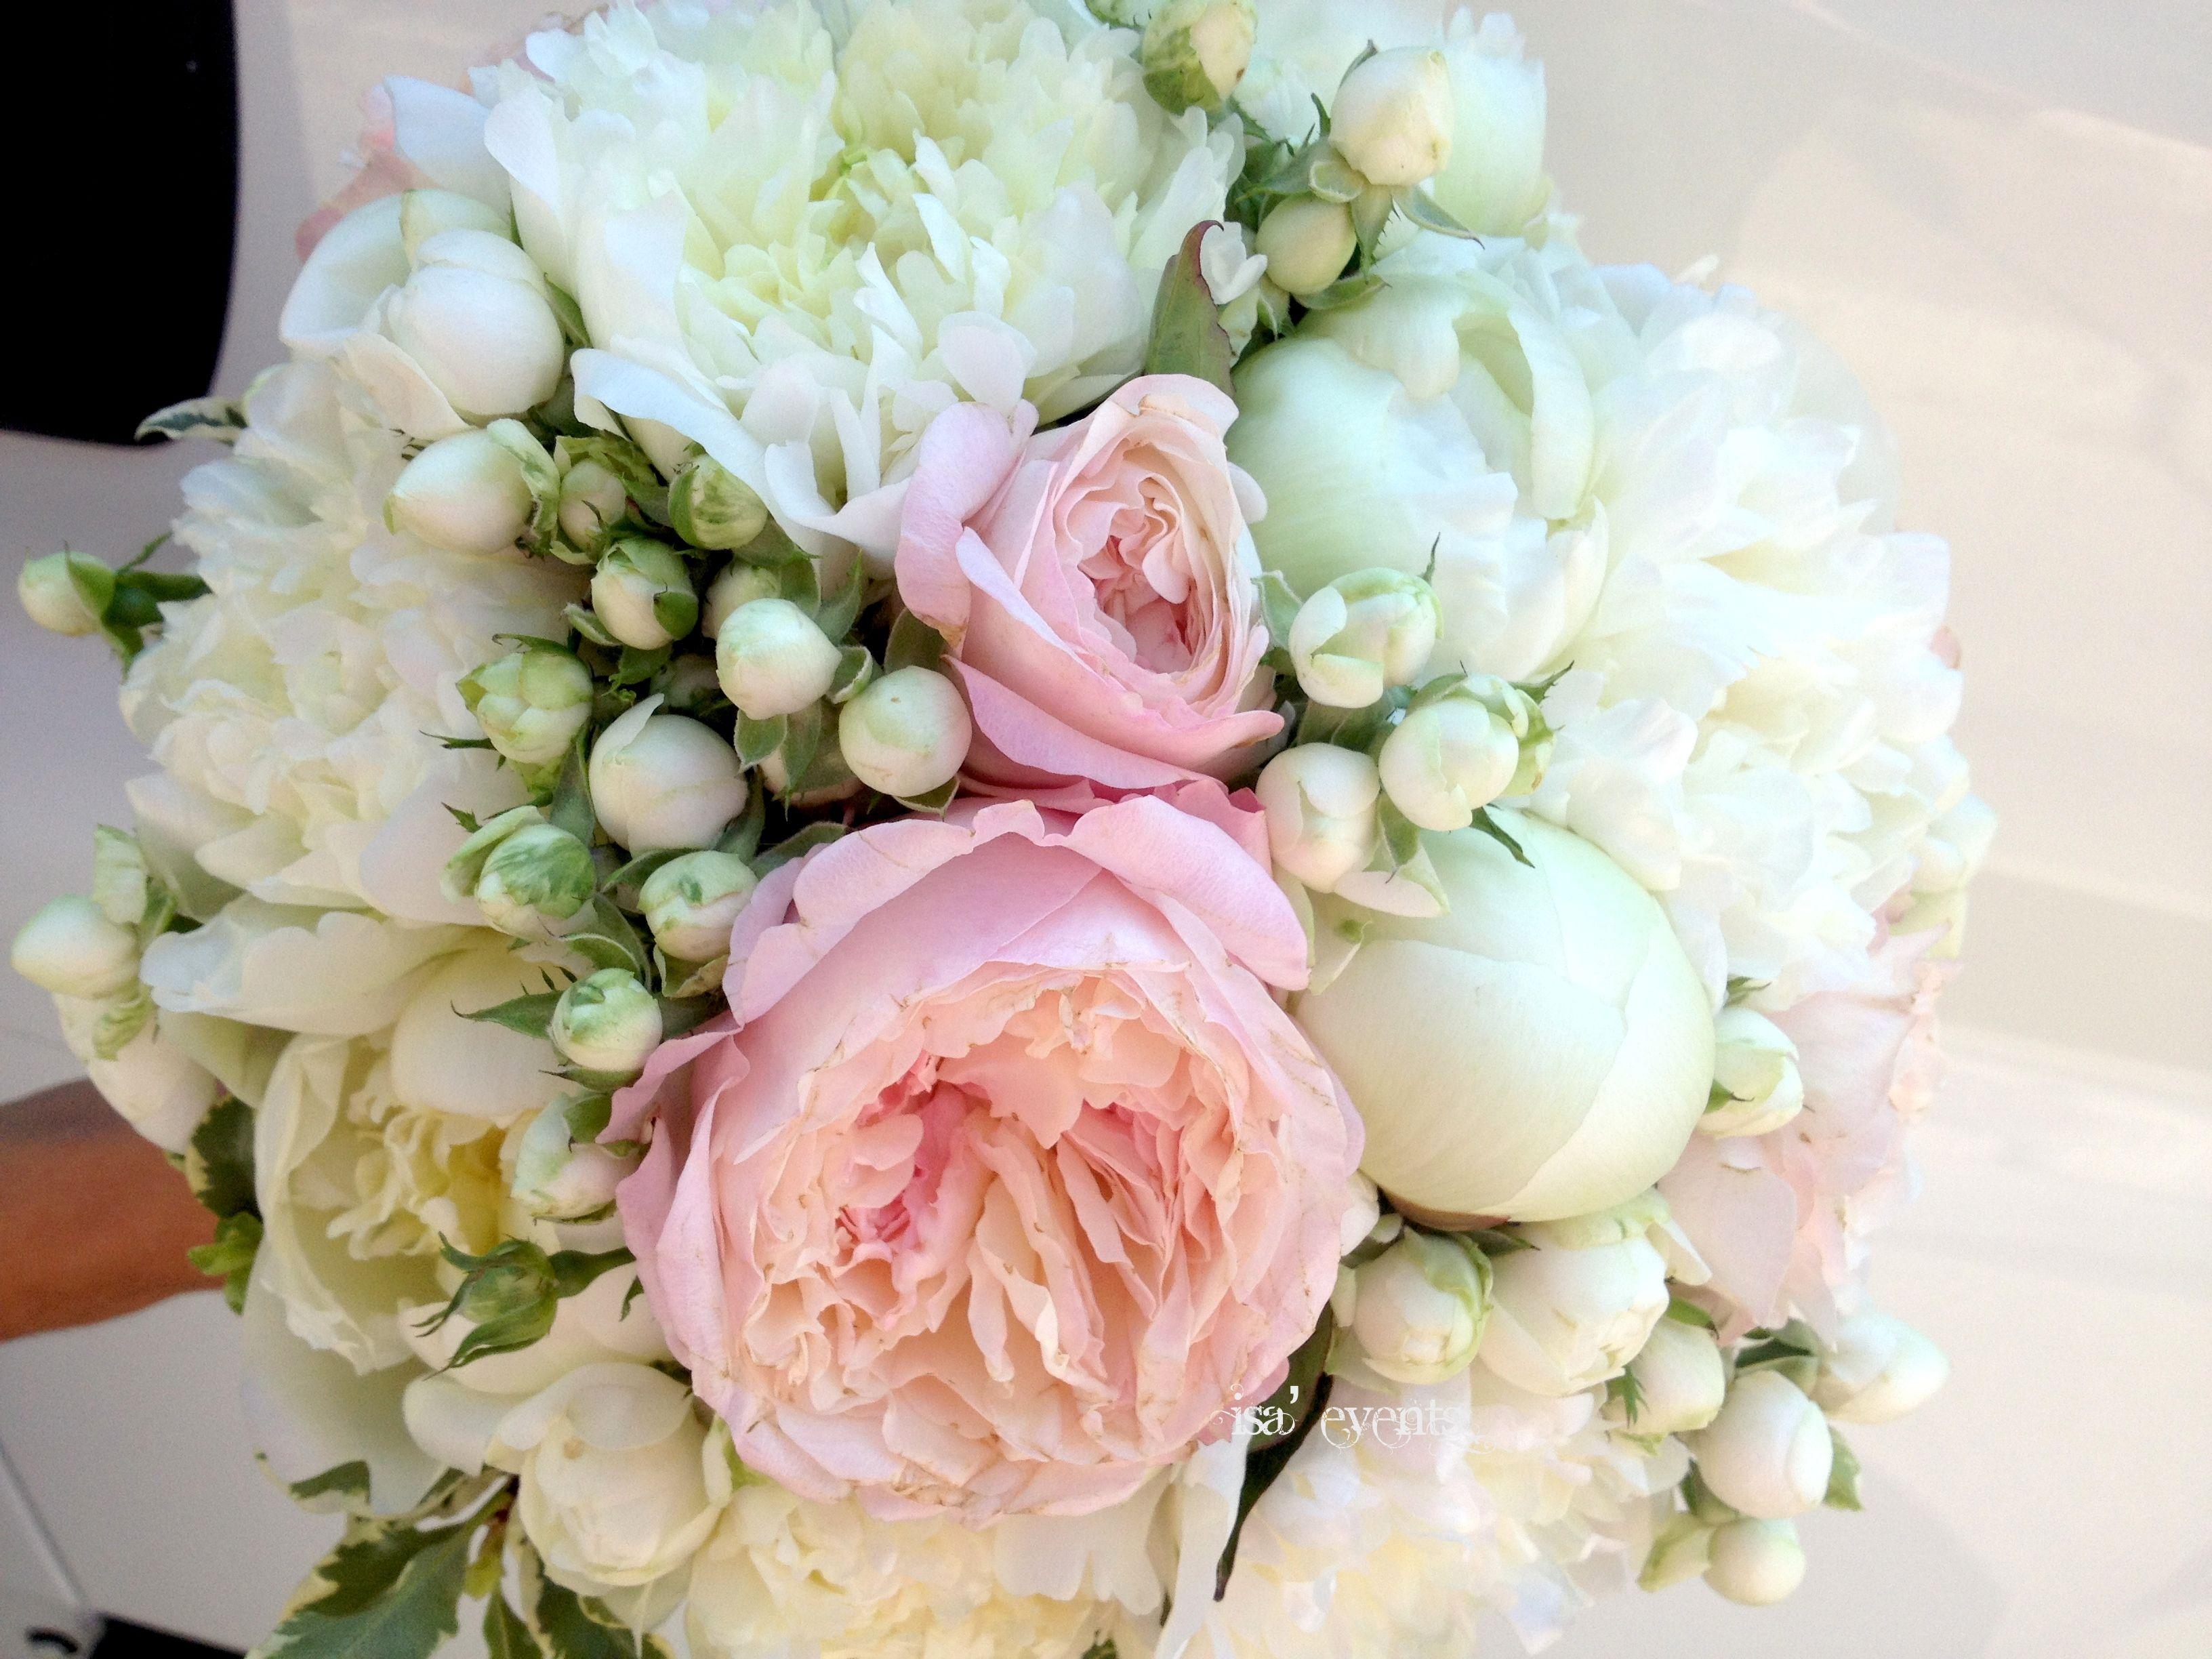 Mazzo Di Fiori English.Bouquet Roses English Peonies And Roses Polianta Bouquet Rose